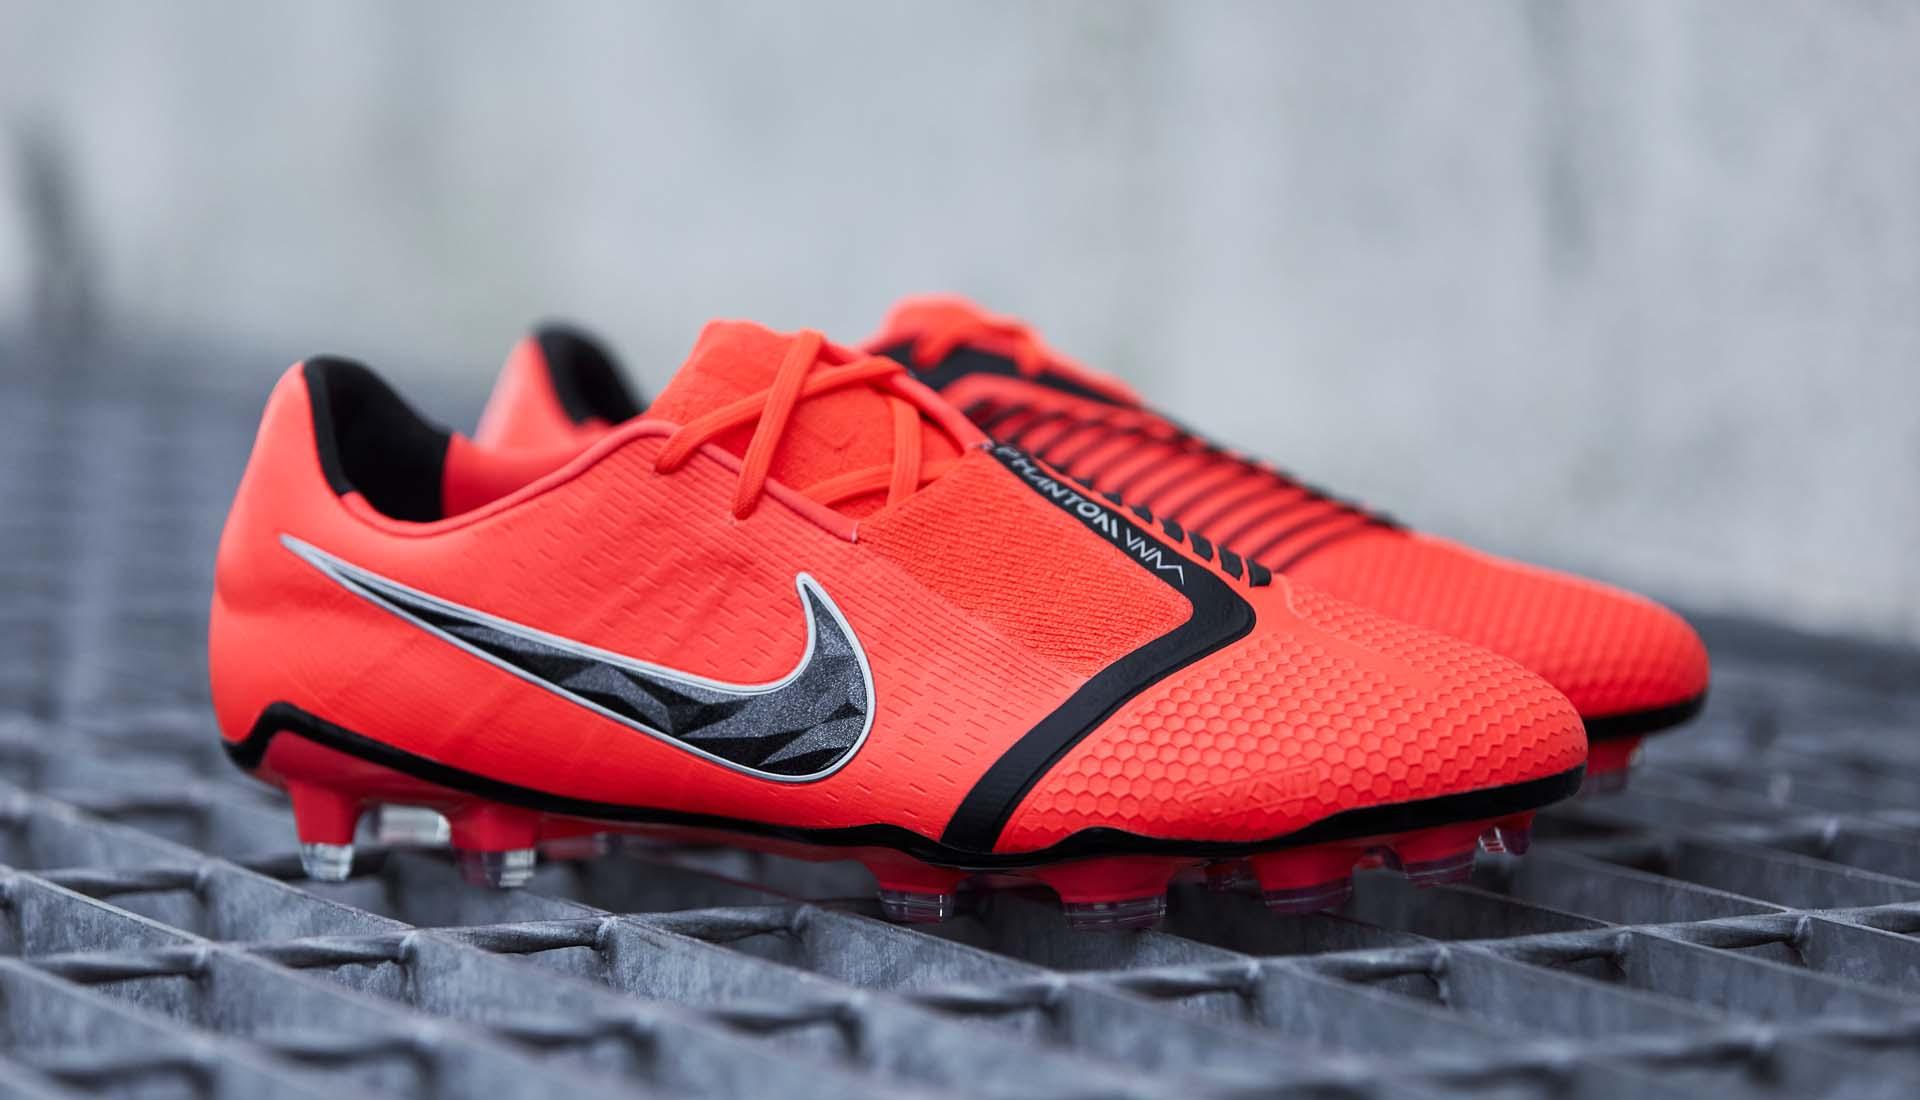 Nike Launch The New PhantomVNM Series - SoccerBible